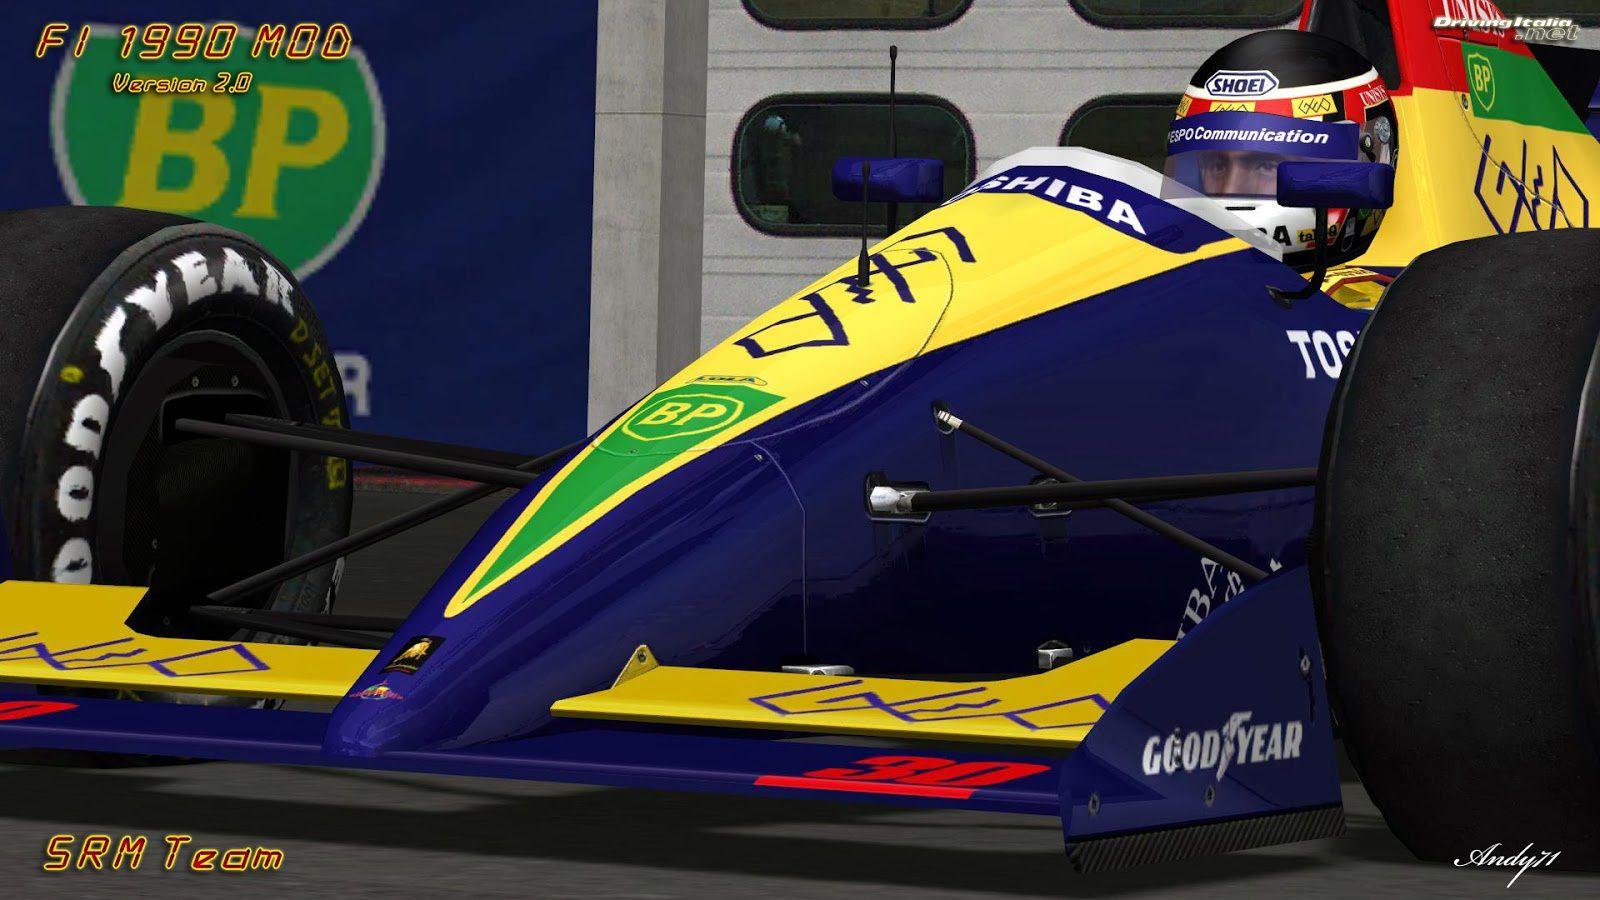 rFactor Mod F1 1990 2 0 disponible ! - The Racing Line